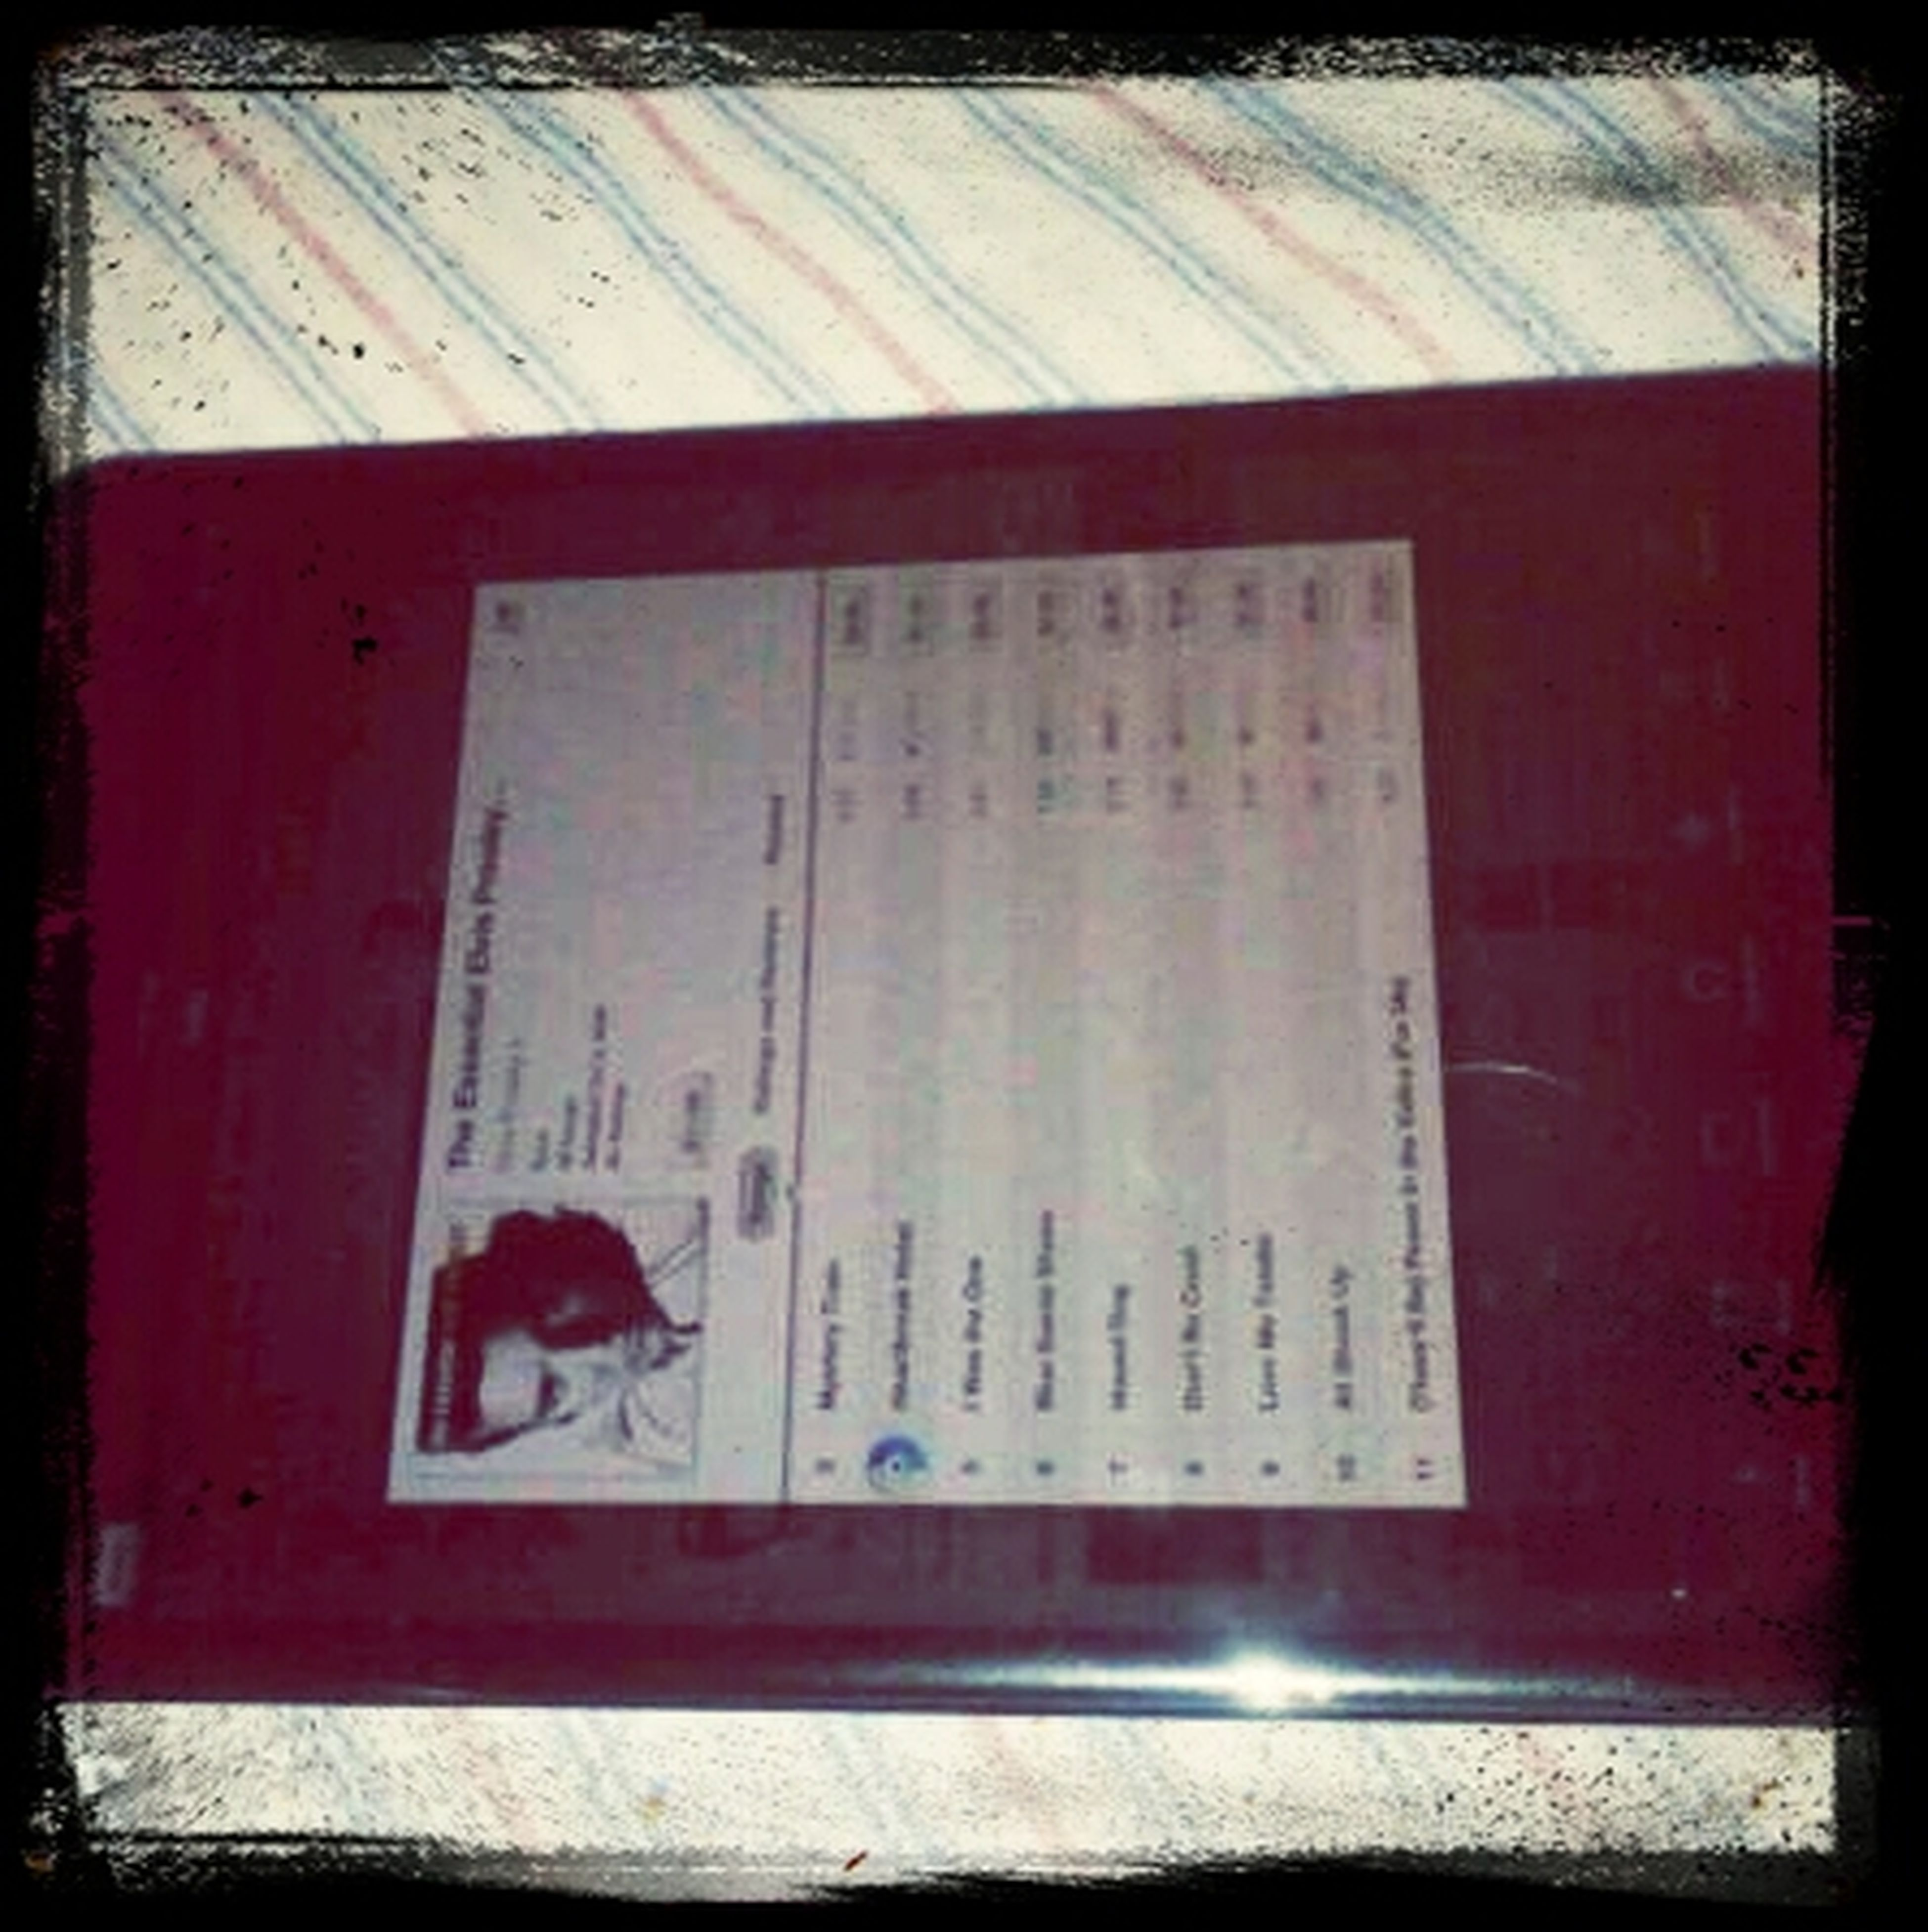 My iPad Mini ^.^